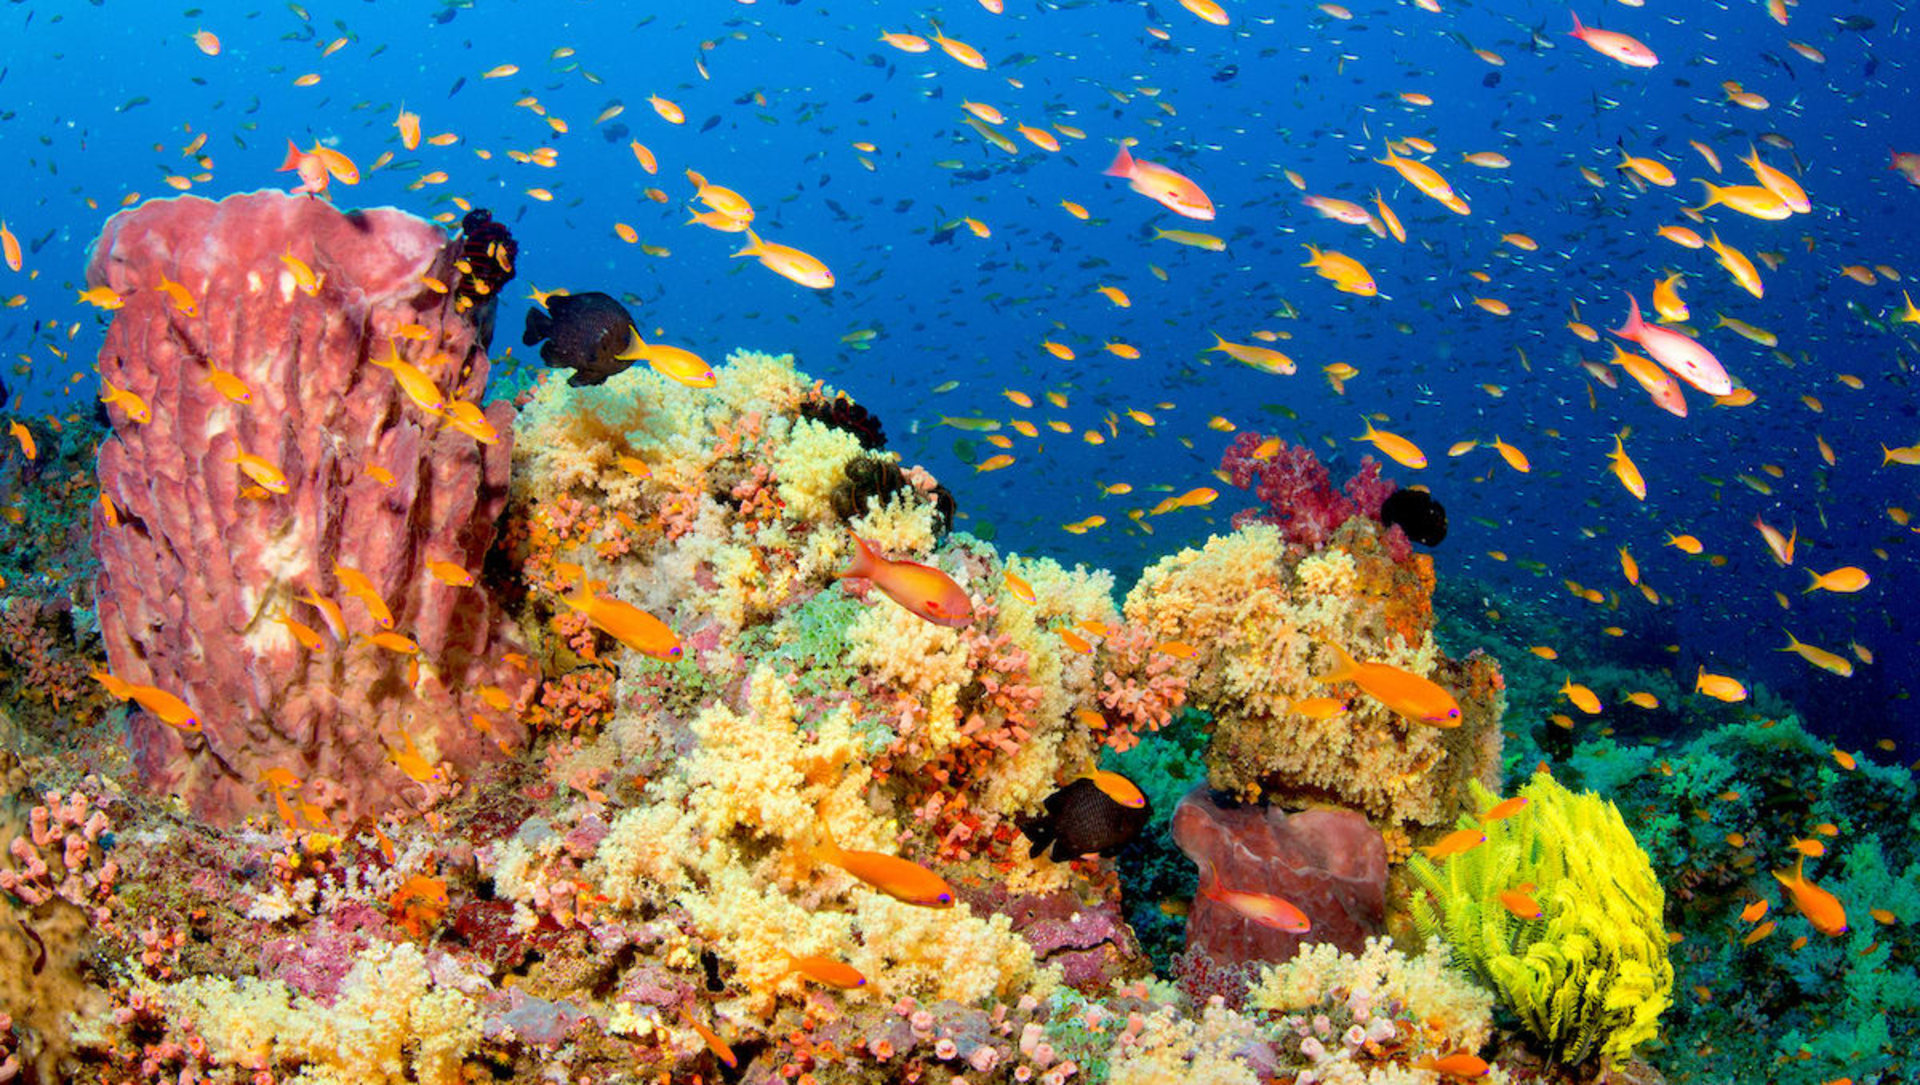 Fishy Phenomena: Sex on the Reef